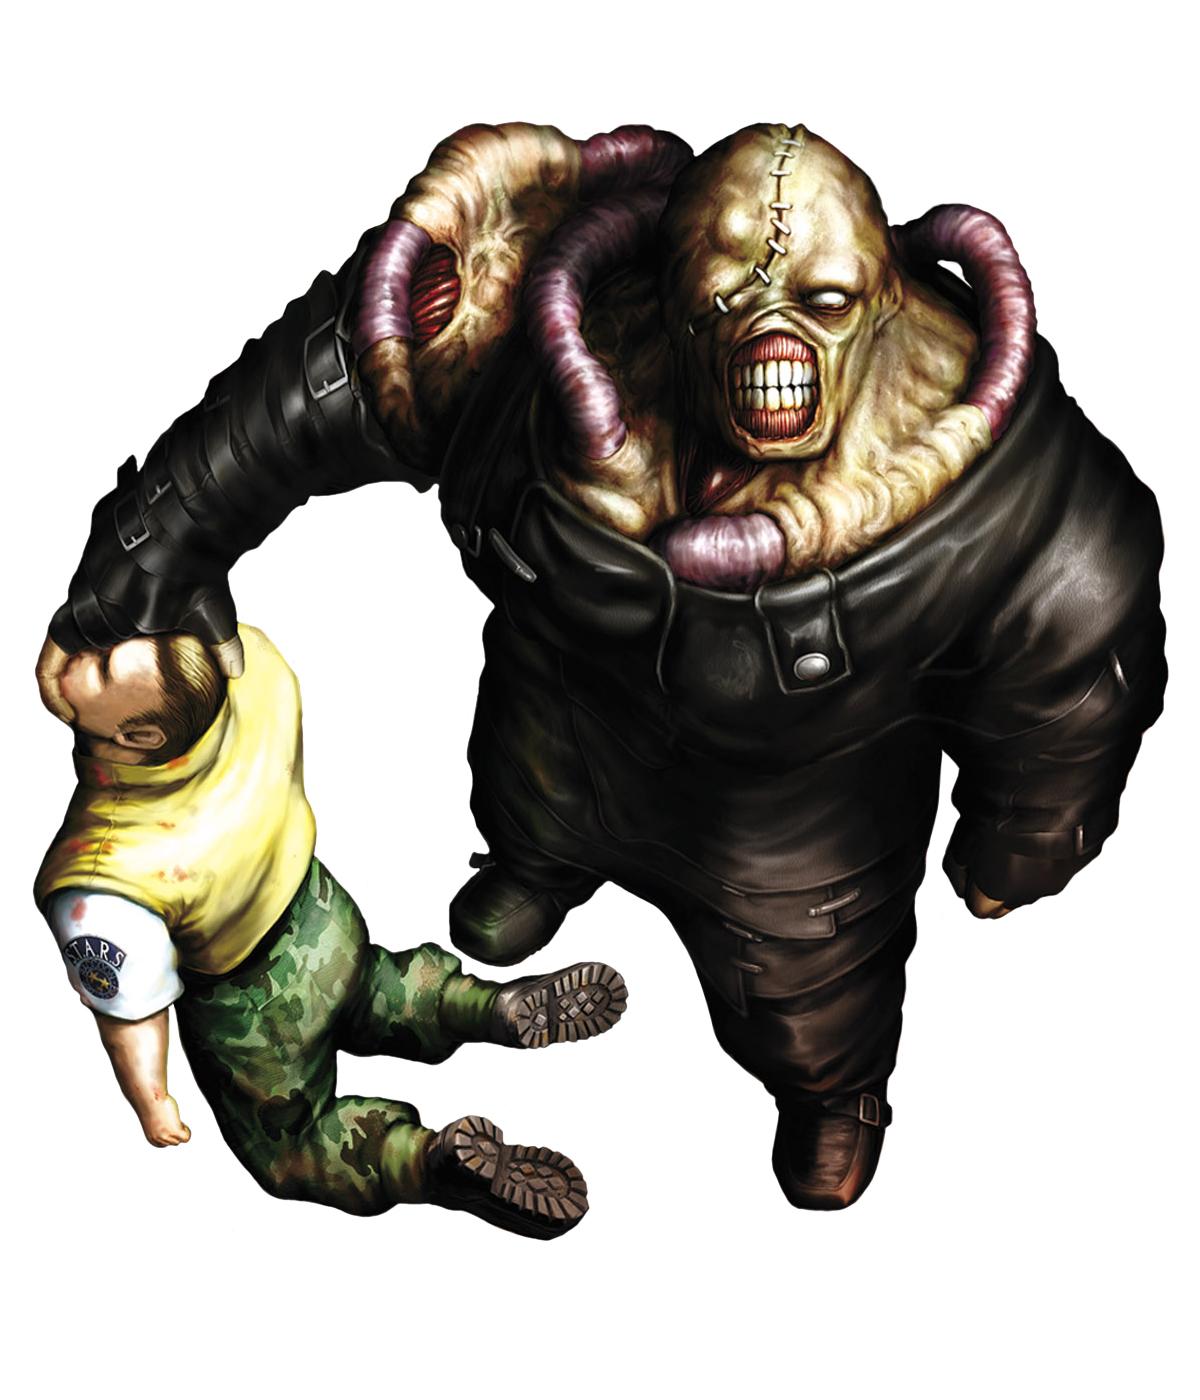 Nemesis-T Type | Resident Evil Wiki | FANDOM powered by Wikia